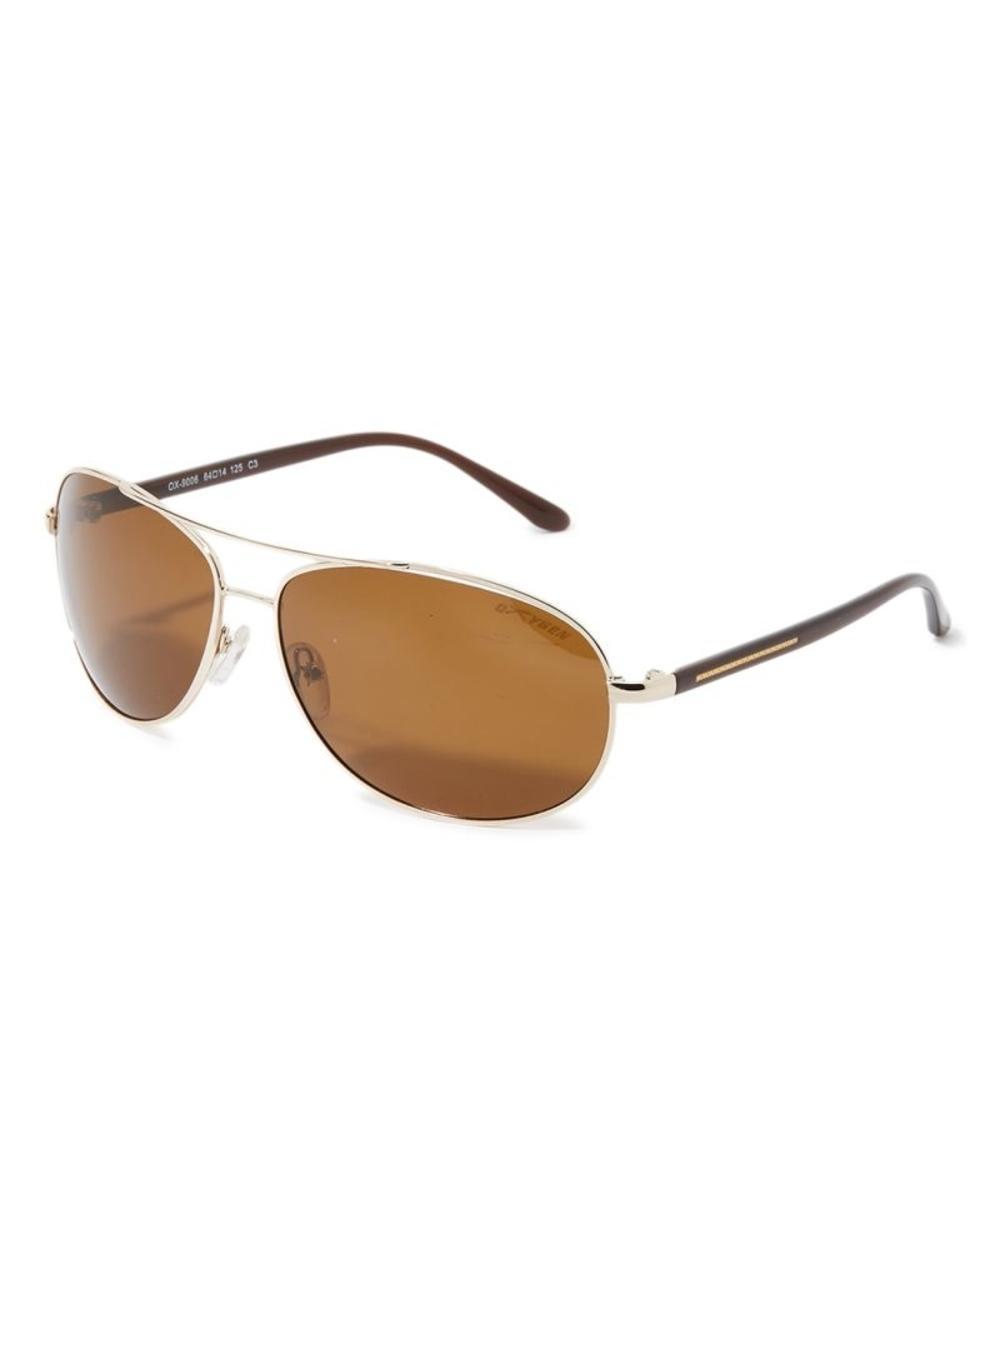 OXYGEN Unisex Aviator Shape UV Protection Sunglasses OX9006-C3